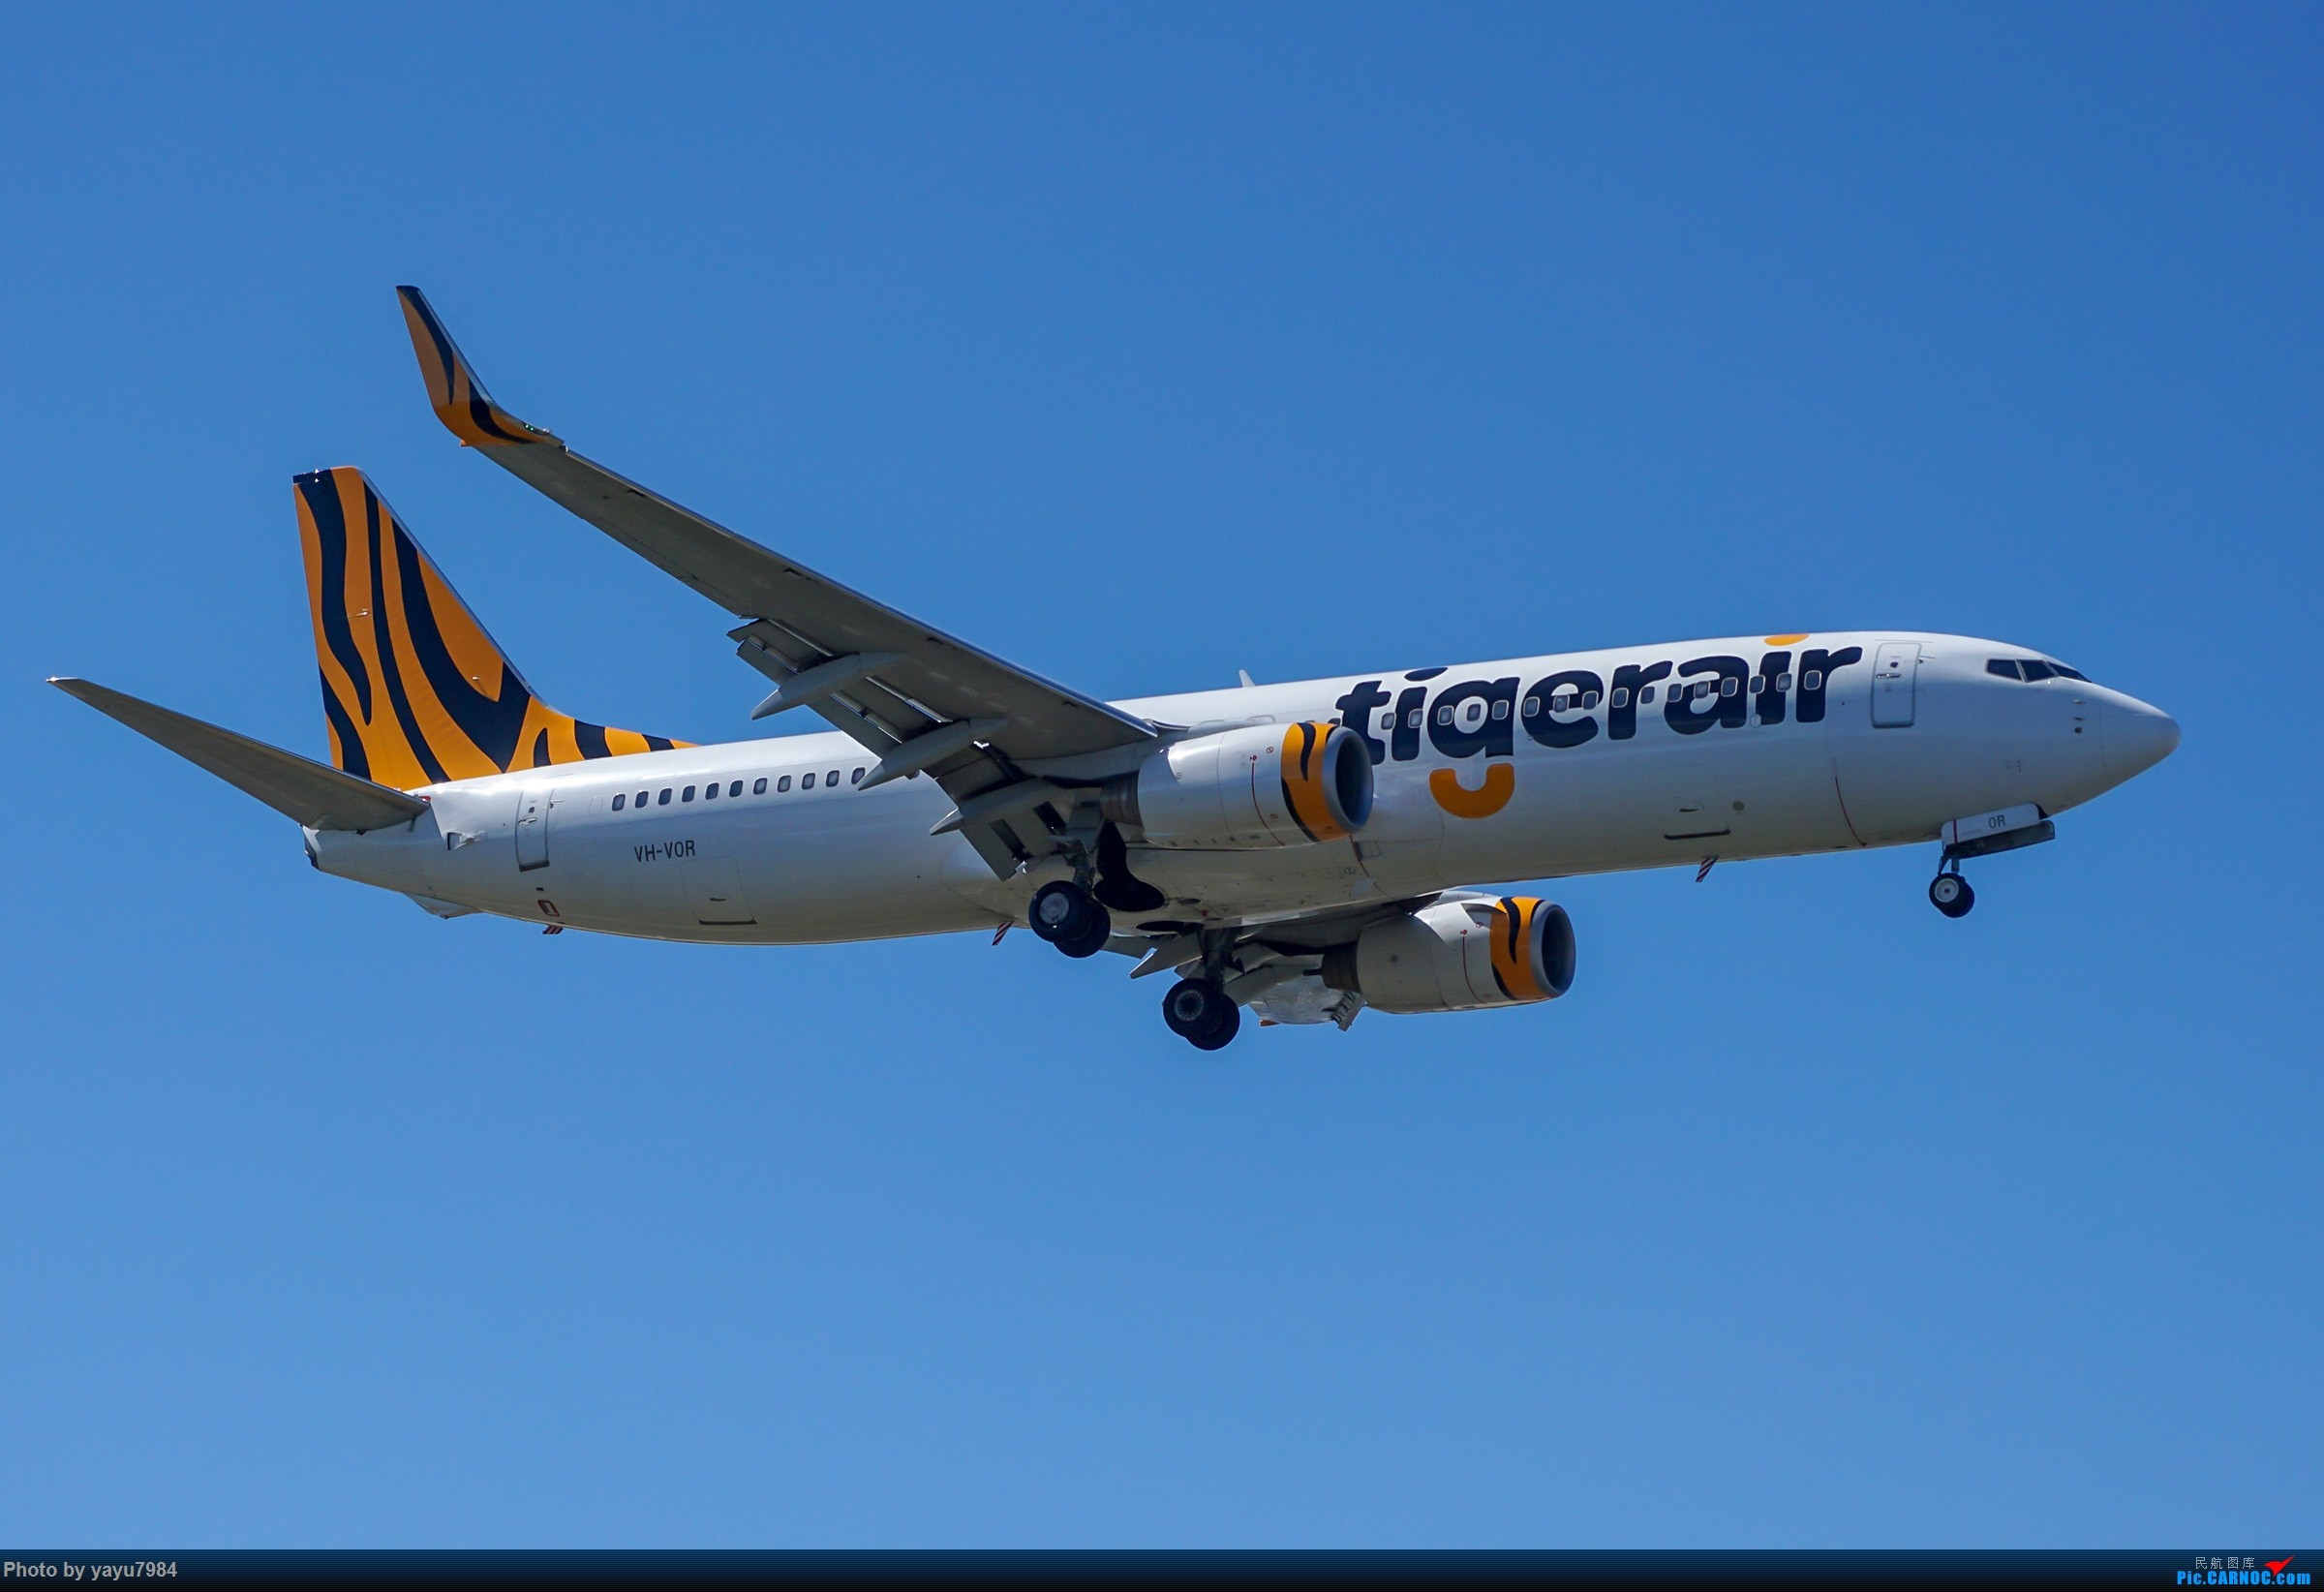 Re:[原创][SYD] 东航天合332,雪绒花343,华航蓝鹊,以及其他日常货 BOEING 737-800 VH-VOR 澳大利亚悉尼金斯福德·史密斯机场